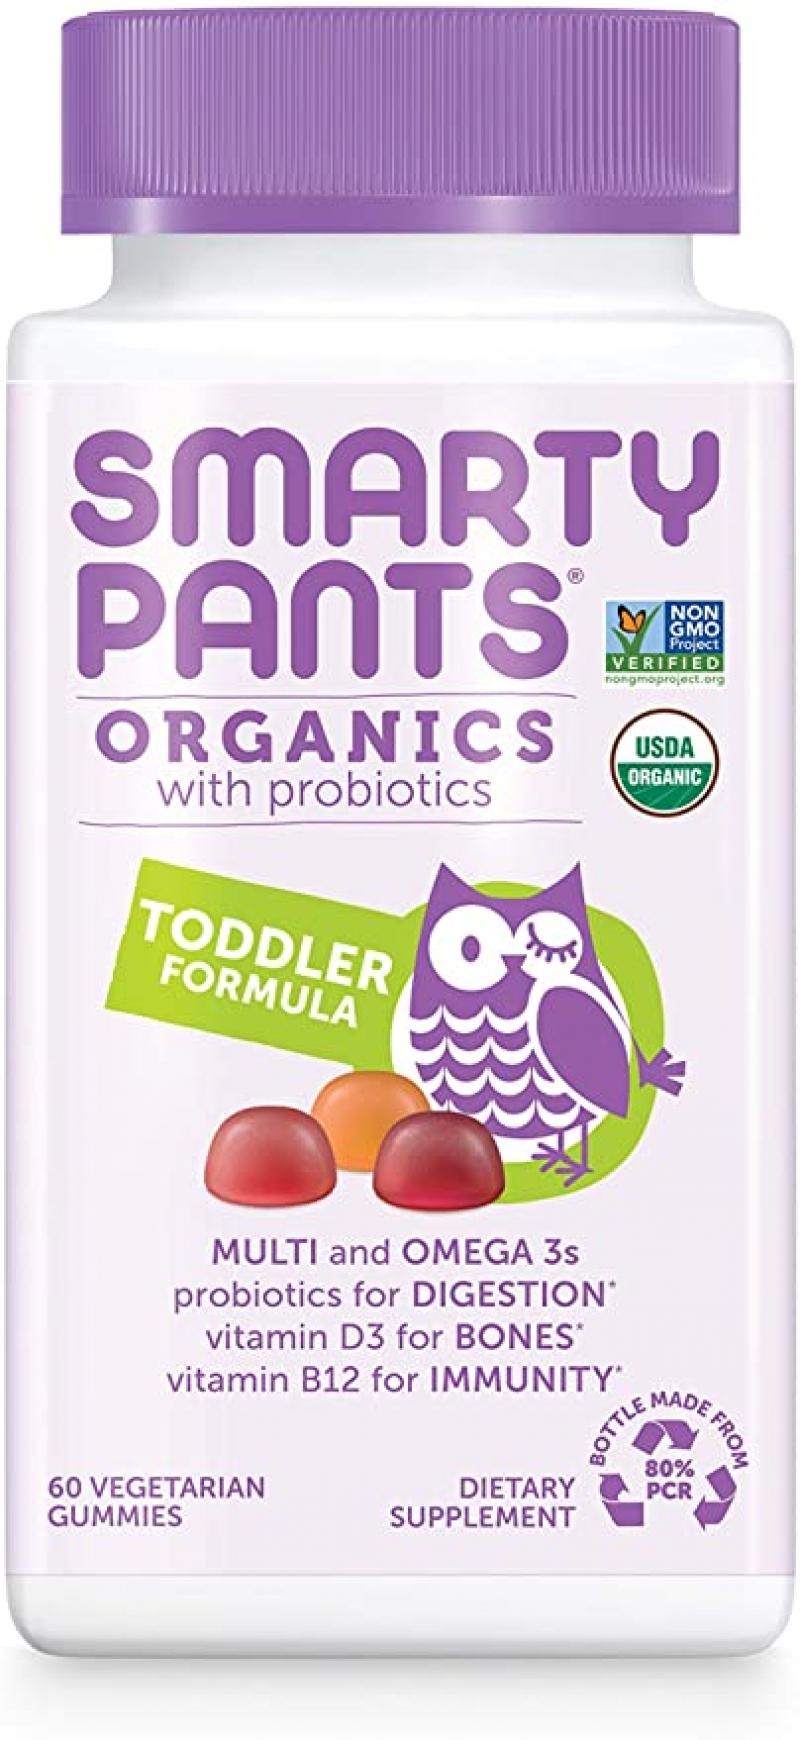 ihocon: SmartyPants Organic Toddler Multivitamin, 60 Gummies, 30 Day Supply  有機幼兒綜合維他命軟糖